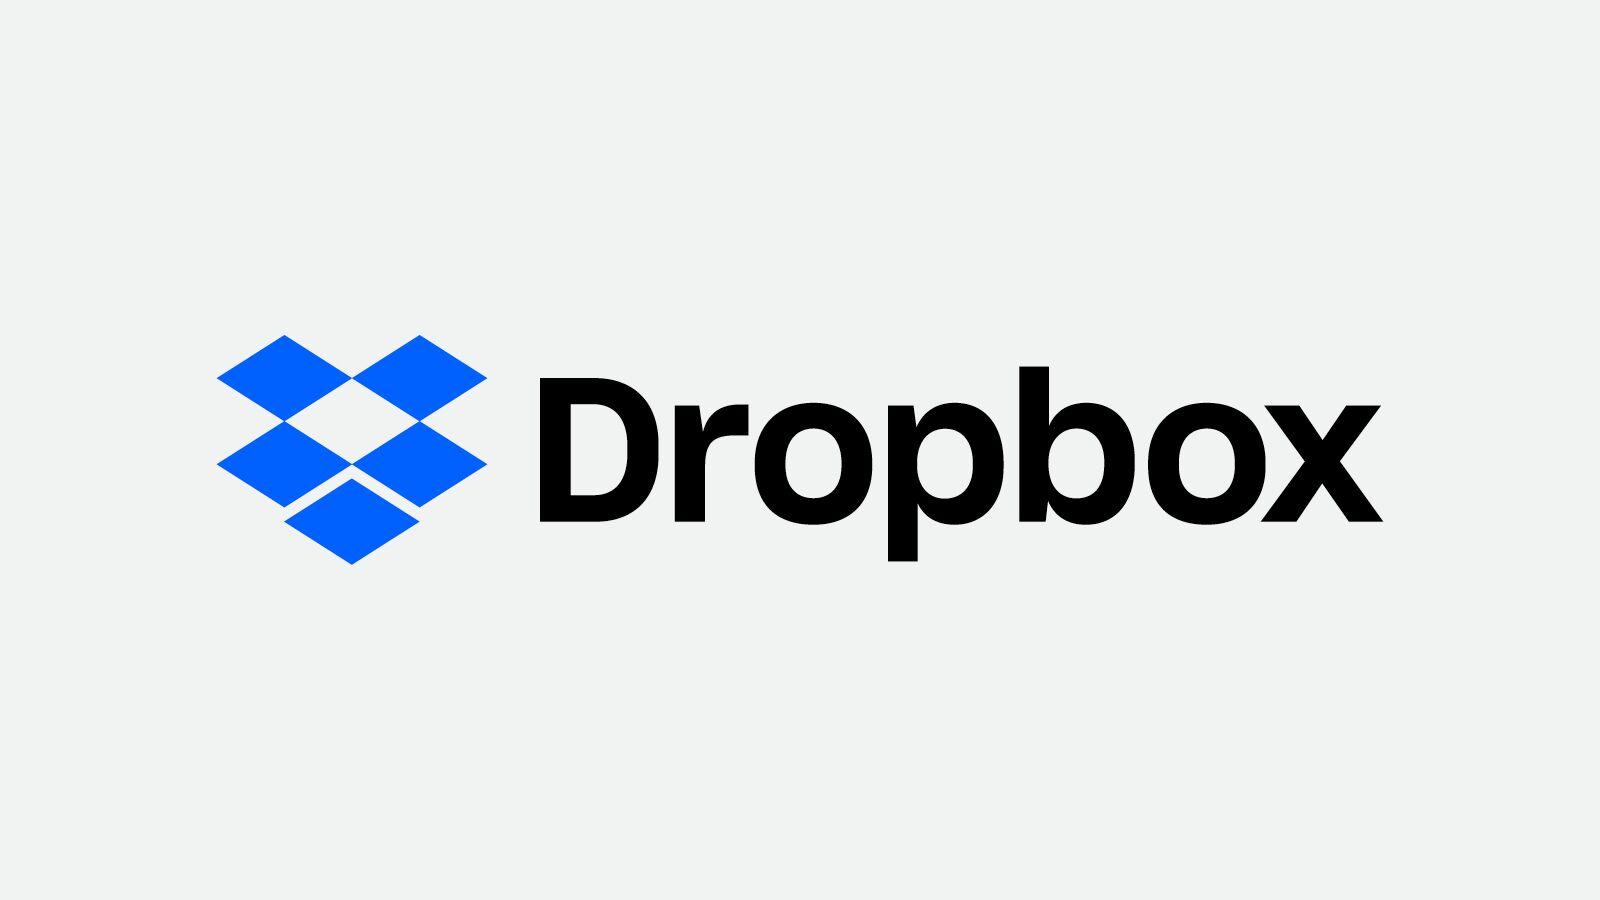 memoria do android dropbox